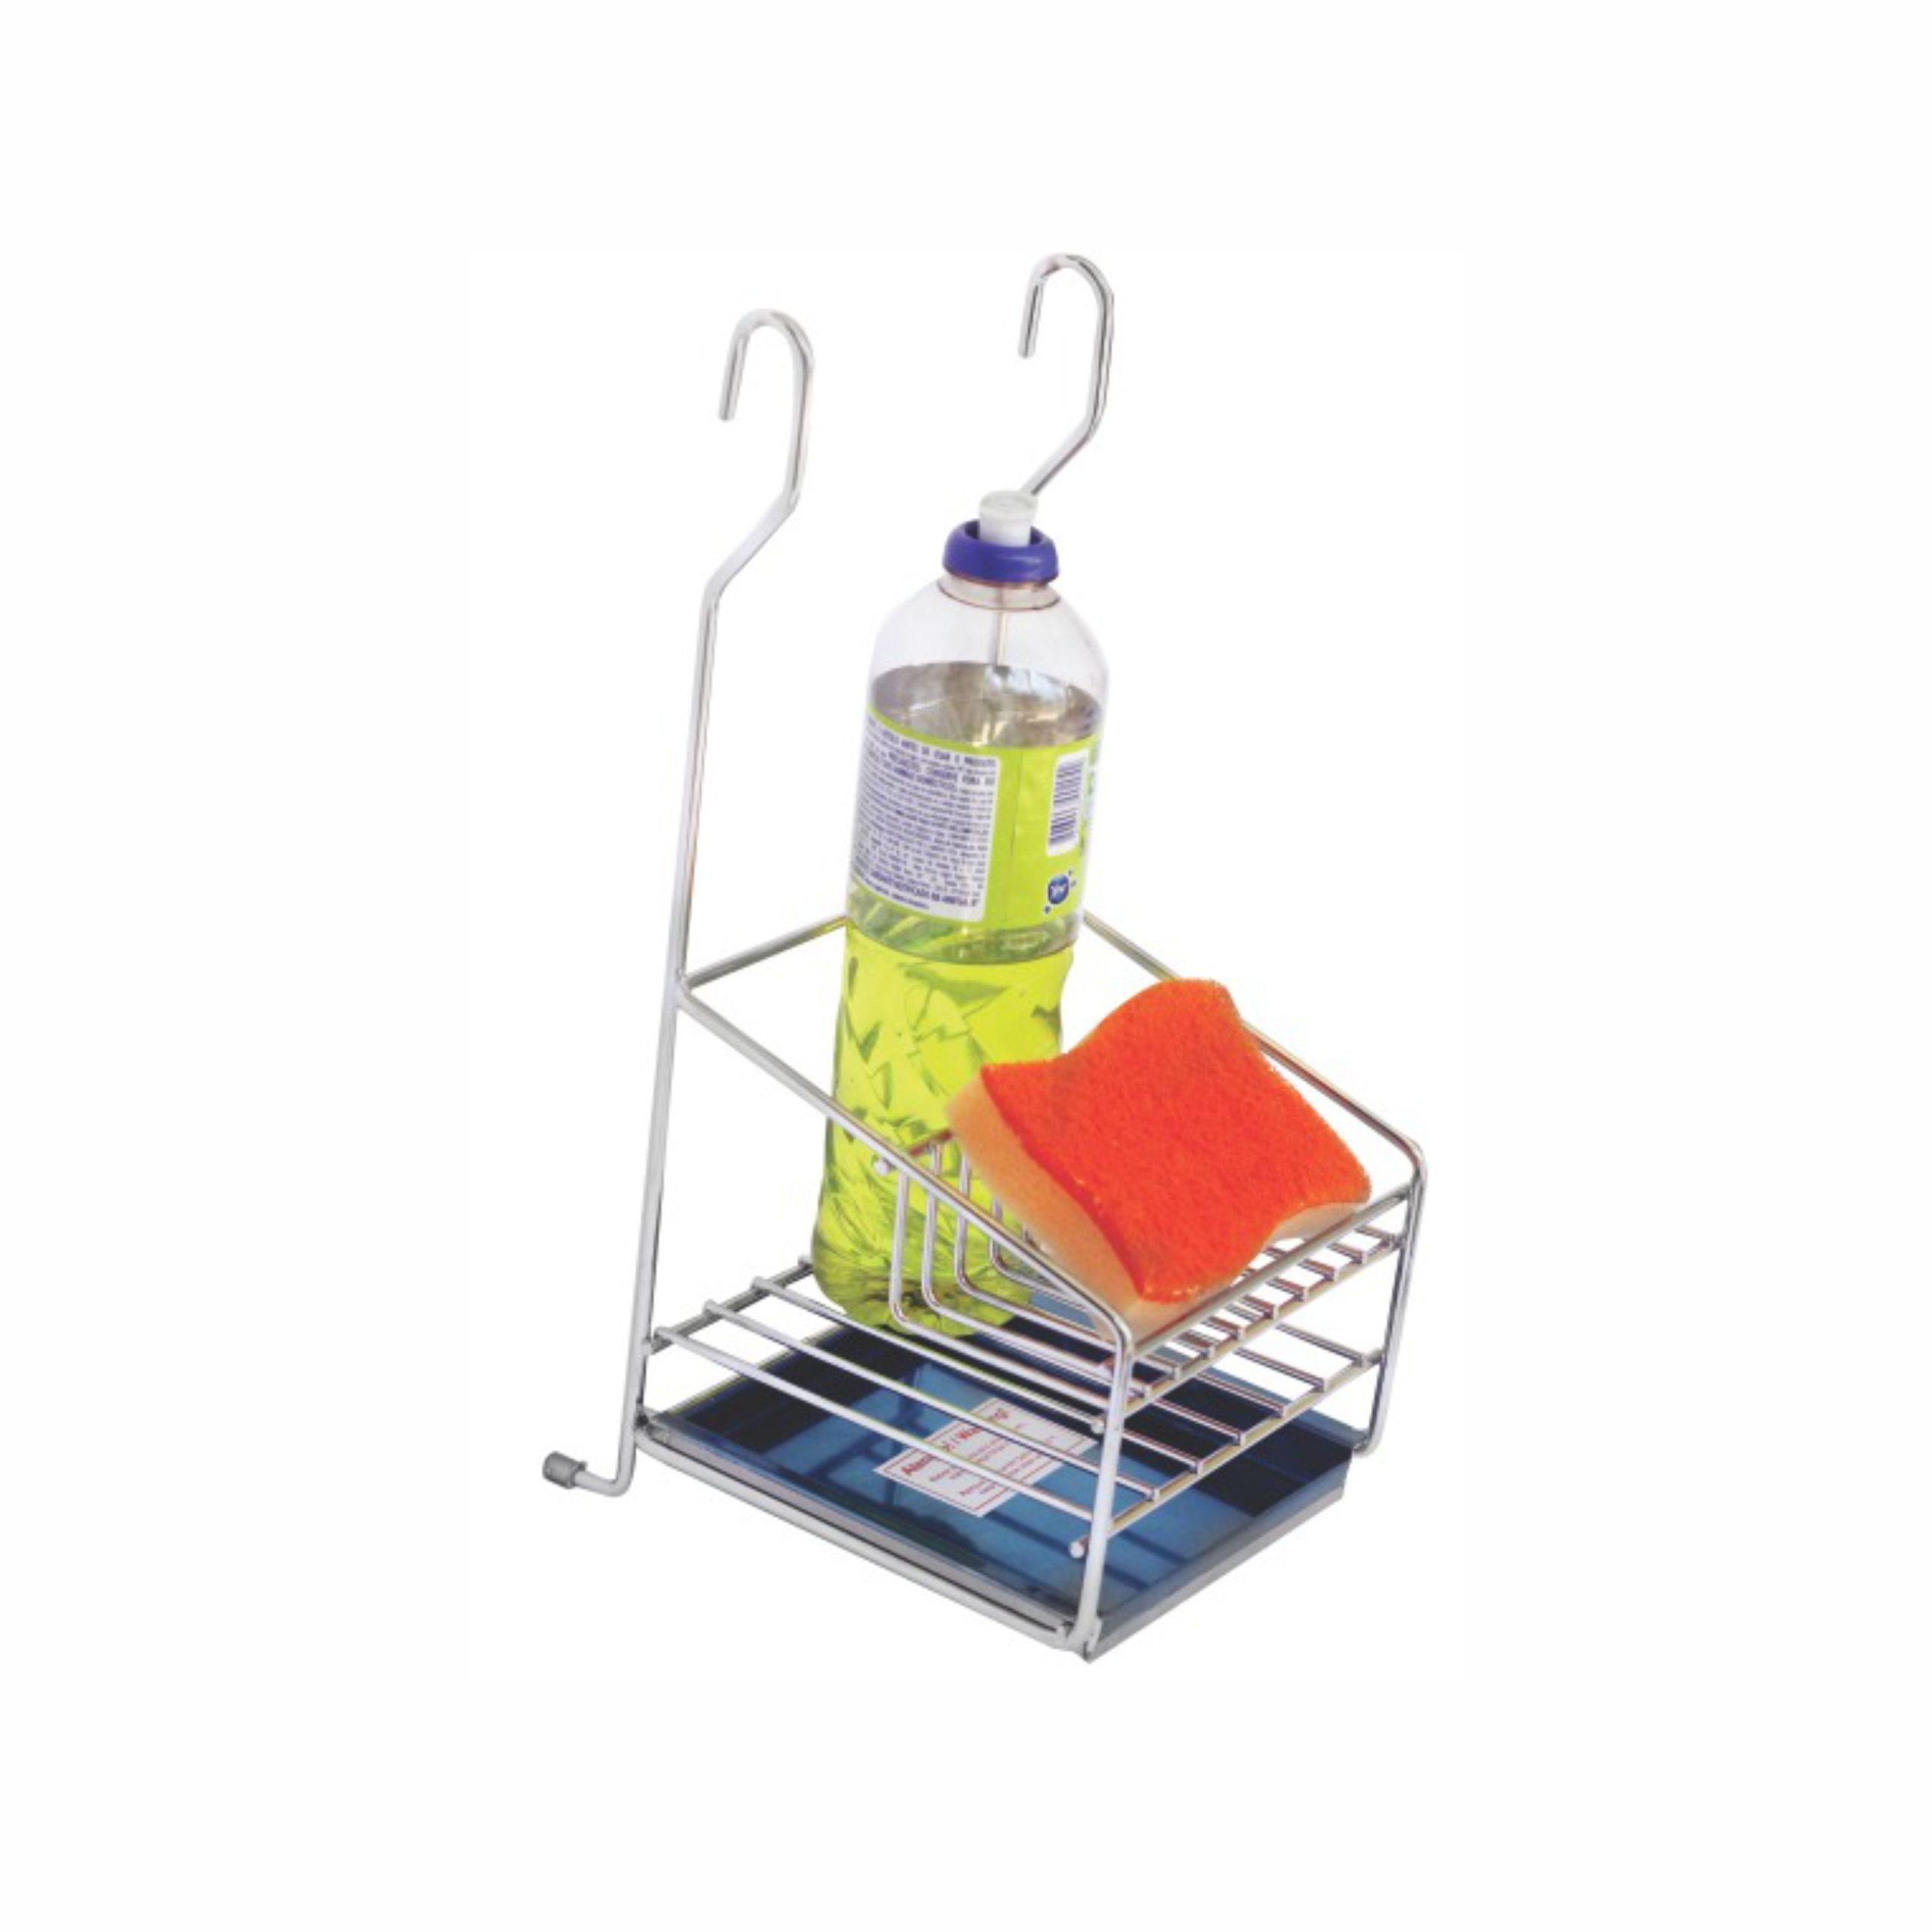 Porta Detergente + Sabão + Esponja Bredal ref. 5010 – Cod: 25858